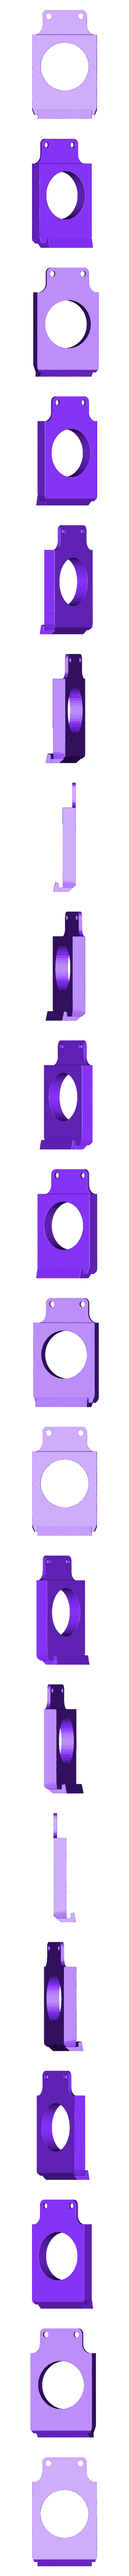 Stabilizer_for_Hotend_V1.stl Download free GCODE file Stabilizer for Hotend (carriage) 2 versions - Two Trees Sapphire 3D printer • 3D printer model, FiveNights